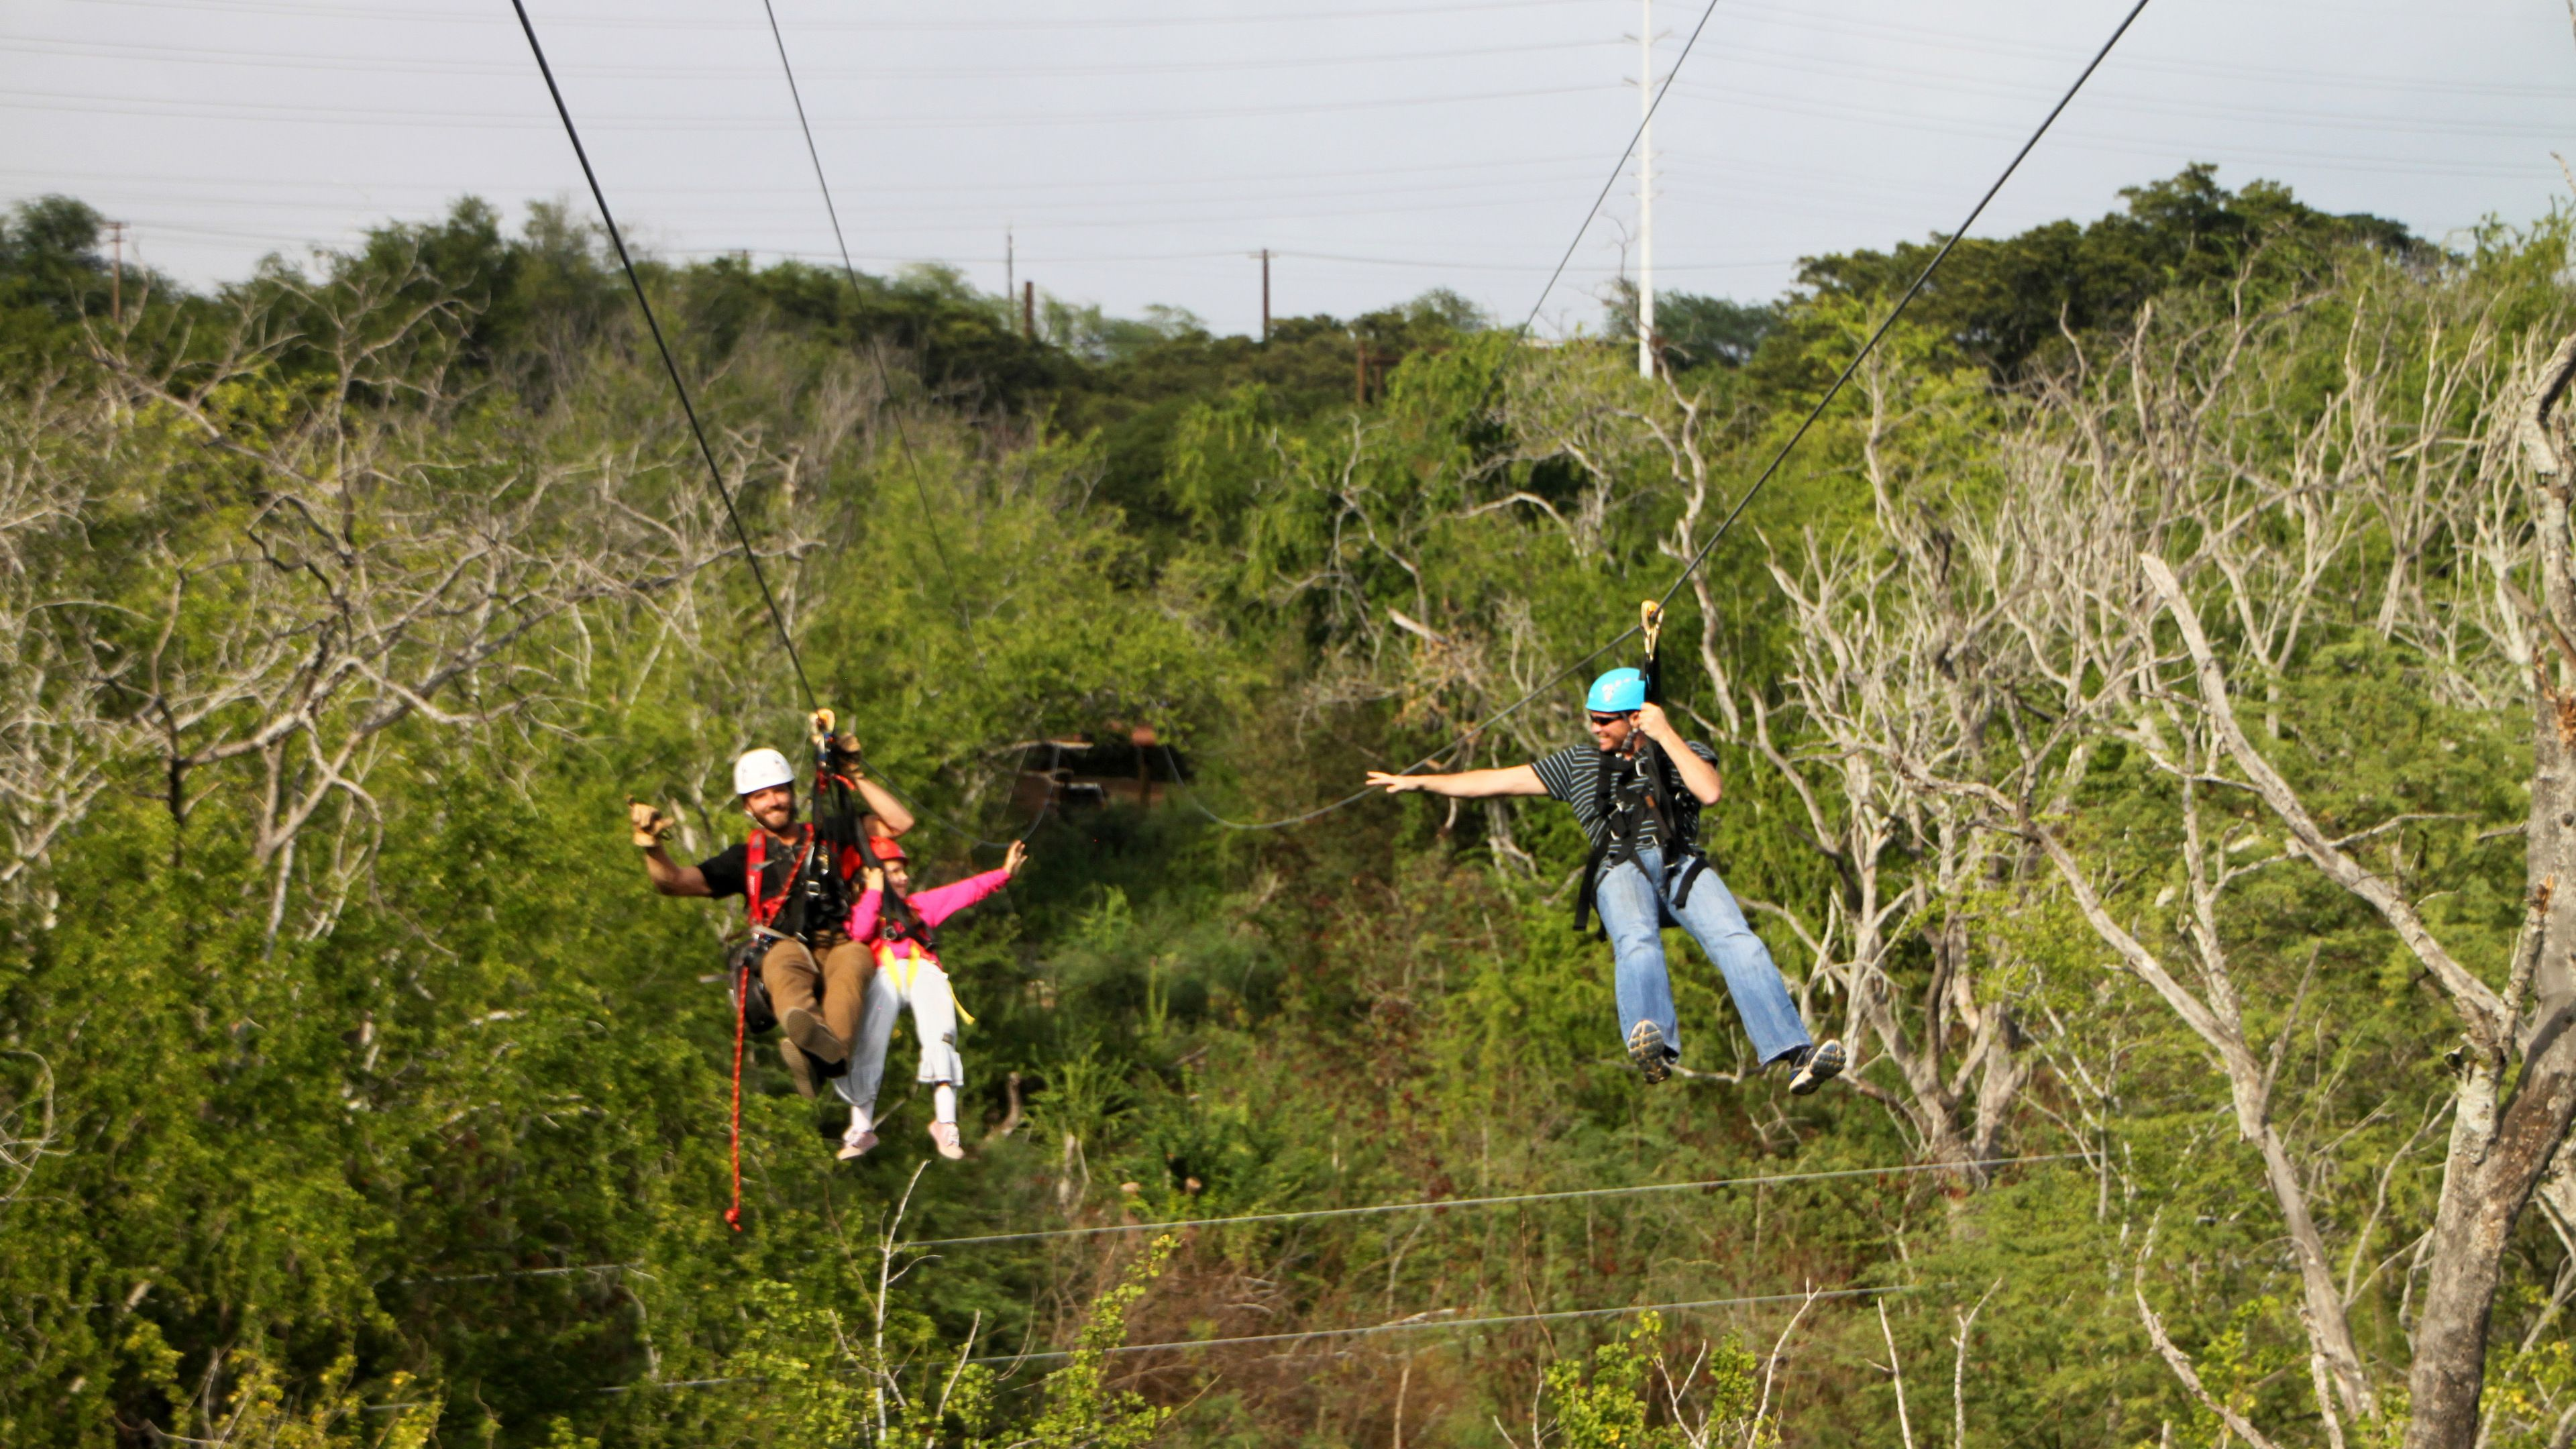 Group ziplining through the trees on Oahu